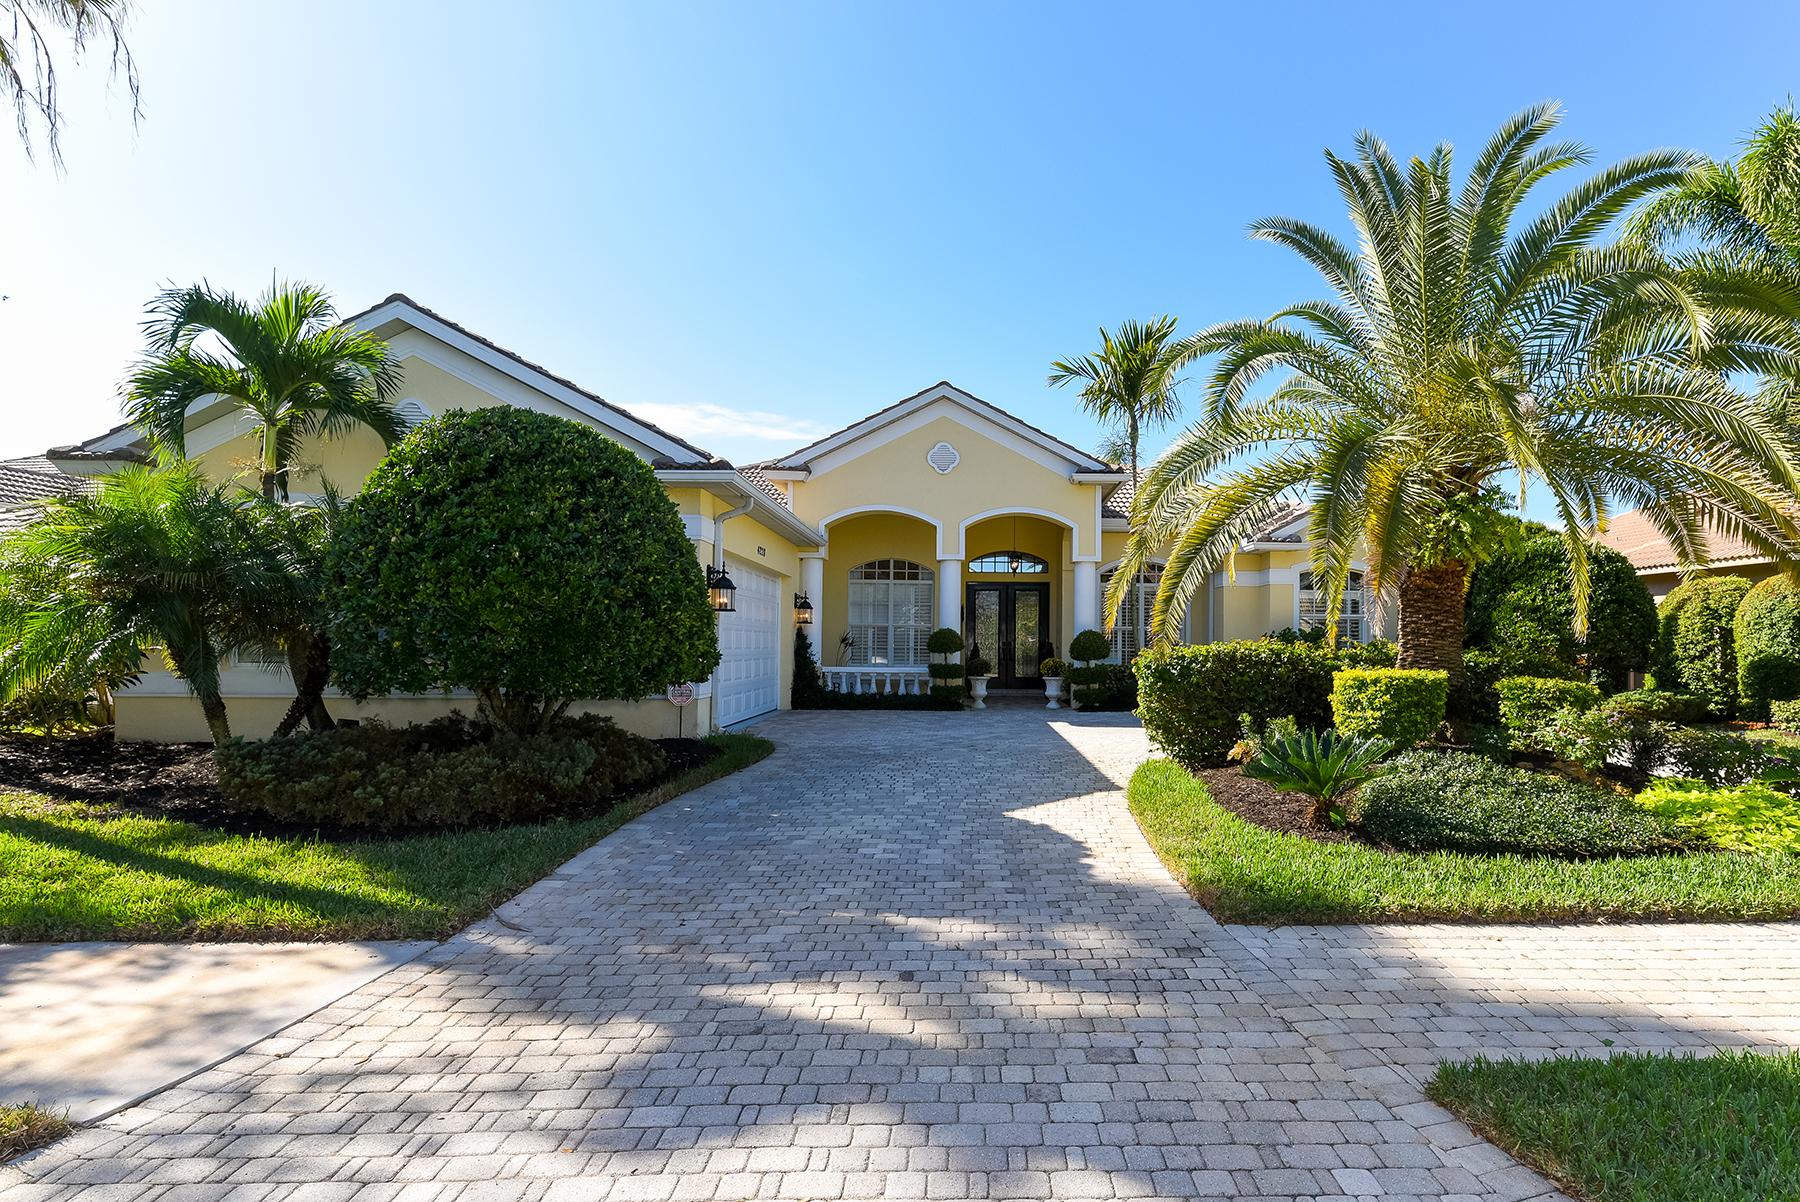 Casa Unifamiliar por un Venta en VENETIA 4228 Corso Venetia Blvd Venice, Florida, 34293 Estados Unidos